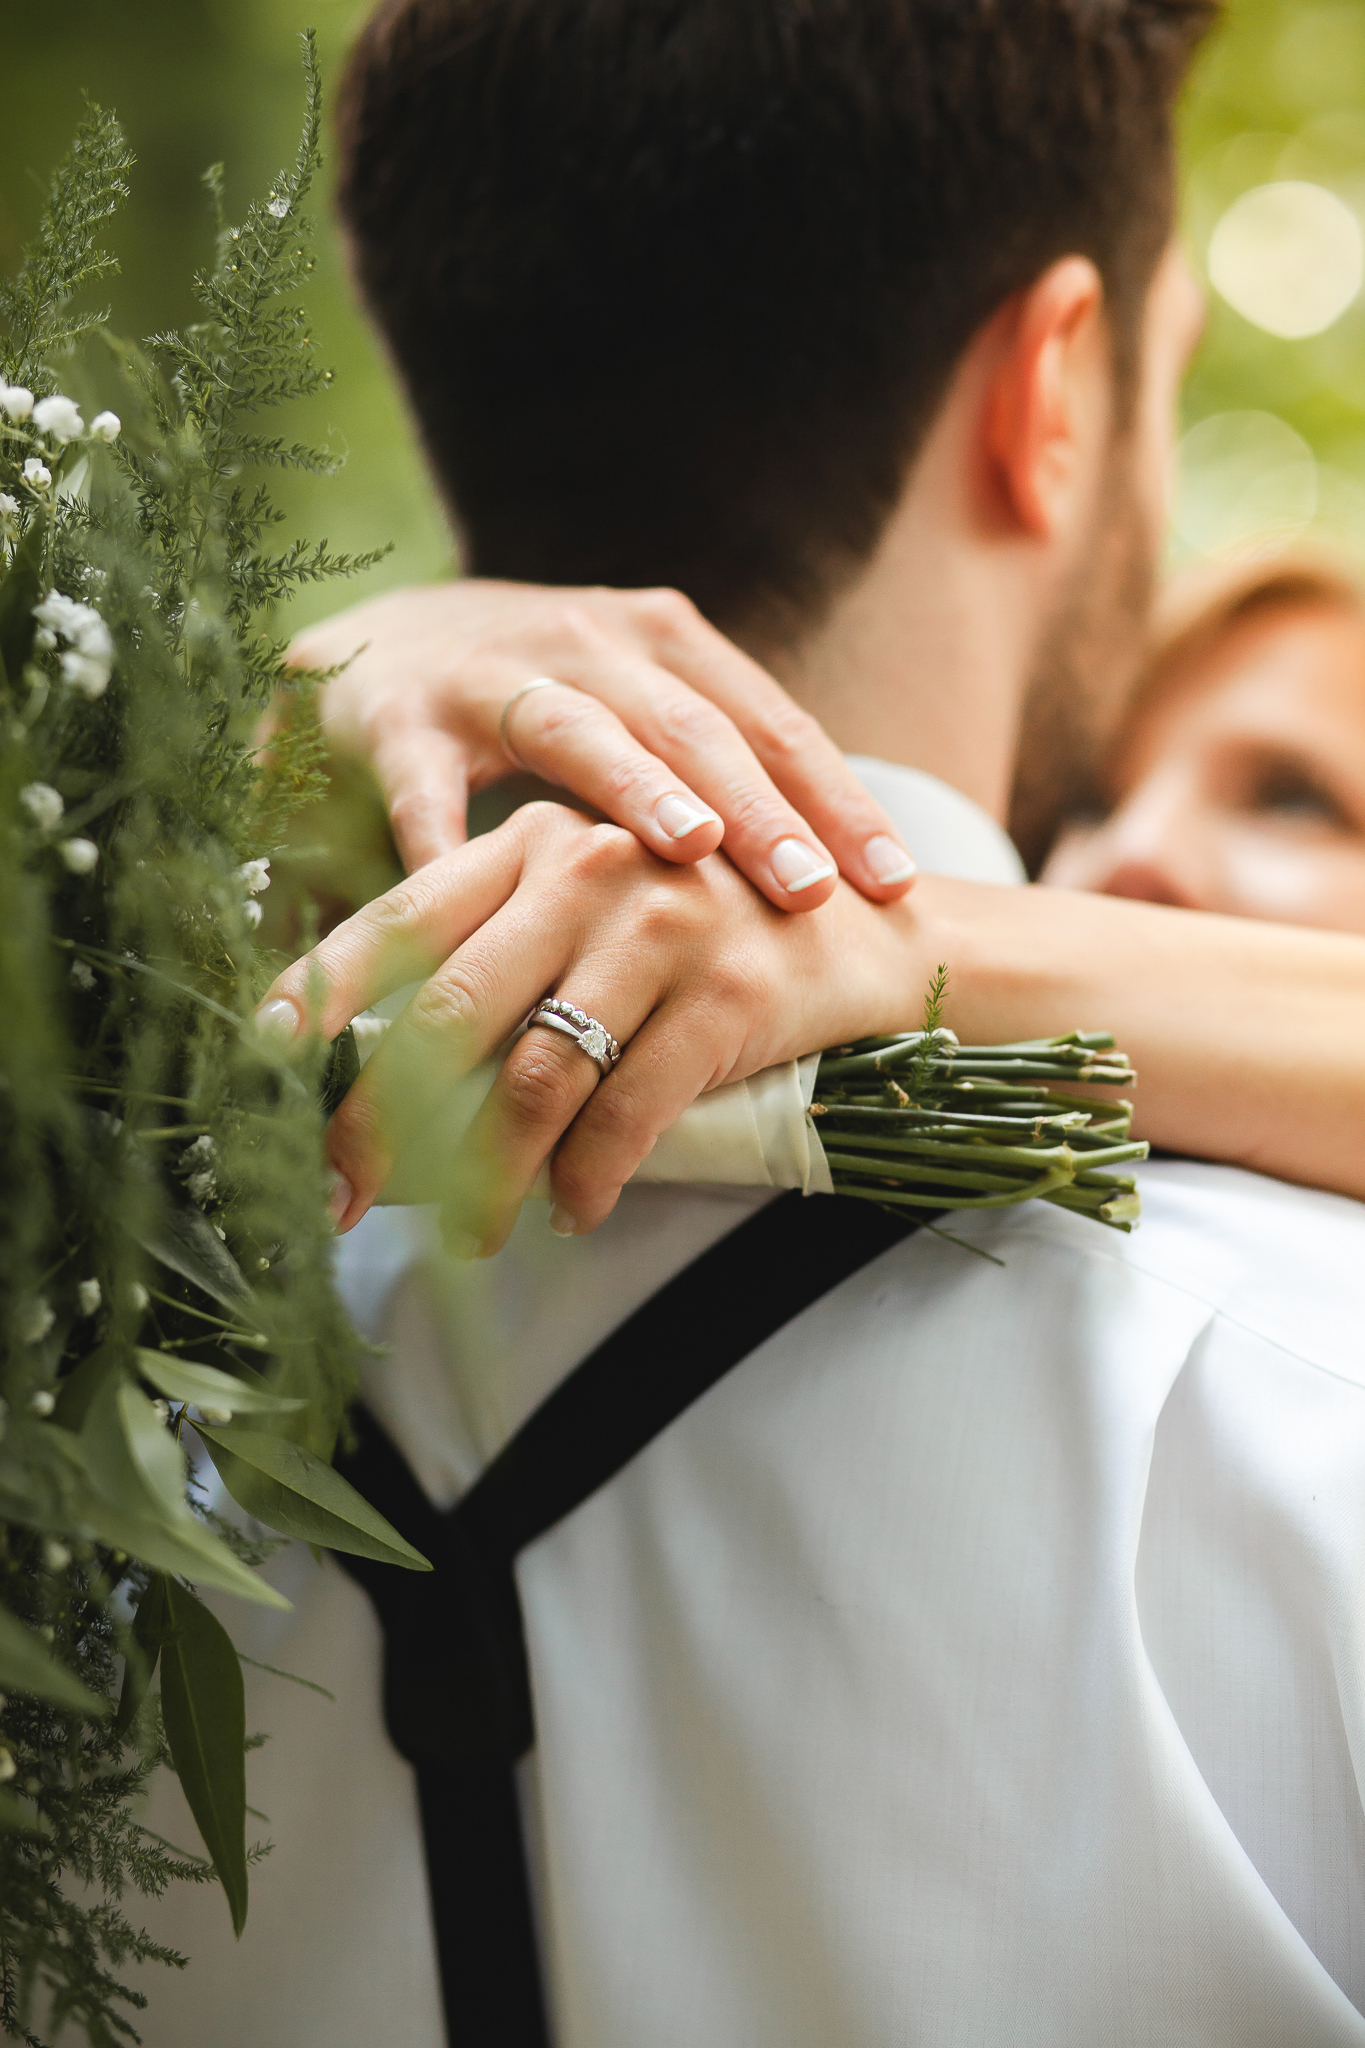 Amy D Photography- Bride and Groom- Wedding Poses- Muskoka Wedding- Barrie Wedding Photographer- Best Wedding Photographer- Muskoka Wedding Photography- Bride Pose- Groom Pose-45.jpg